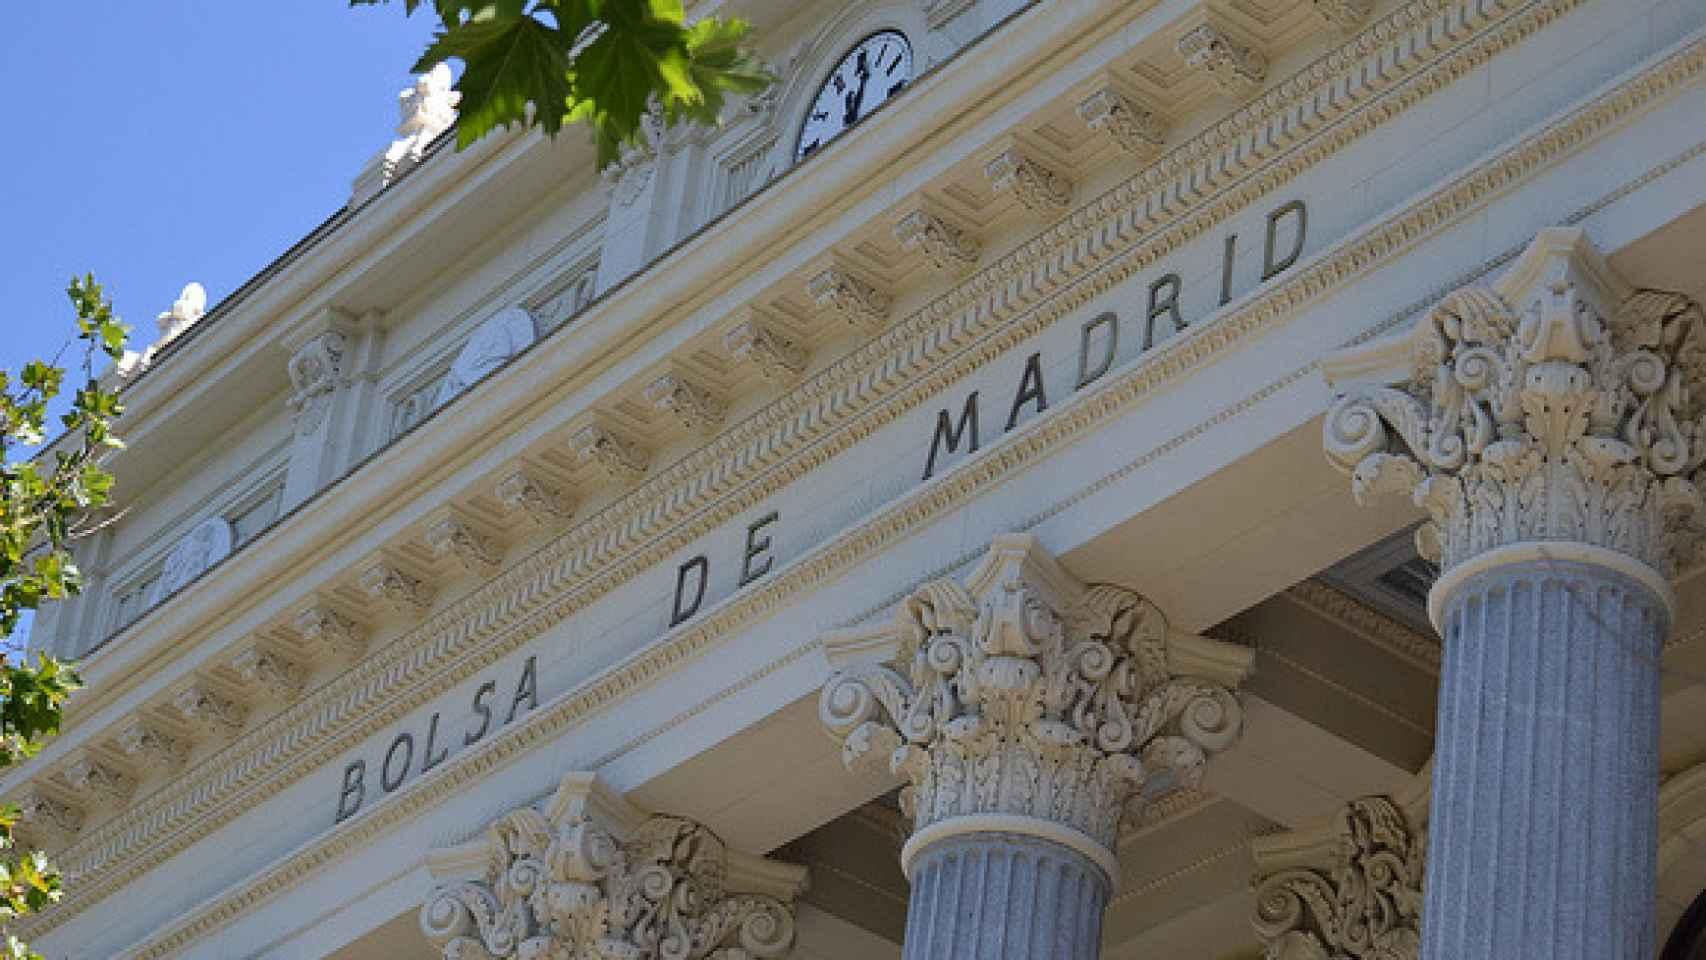 Detalle  en la fachada del Palacio de la Bolsa de Madrid.